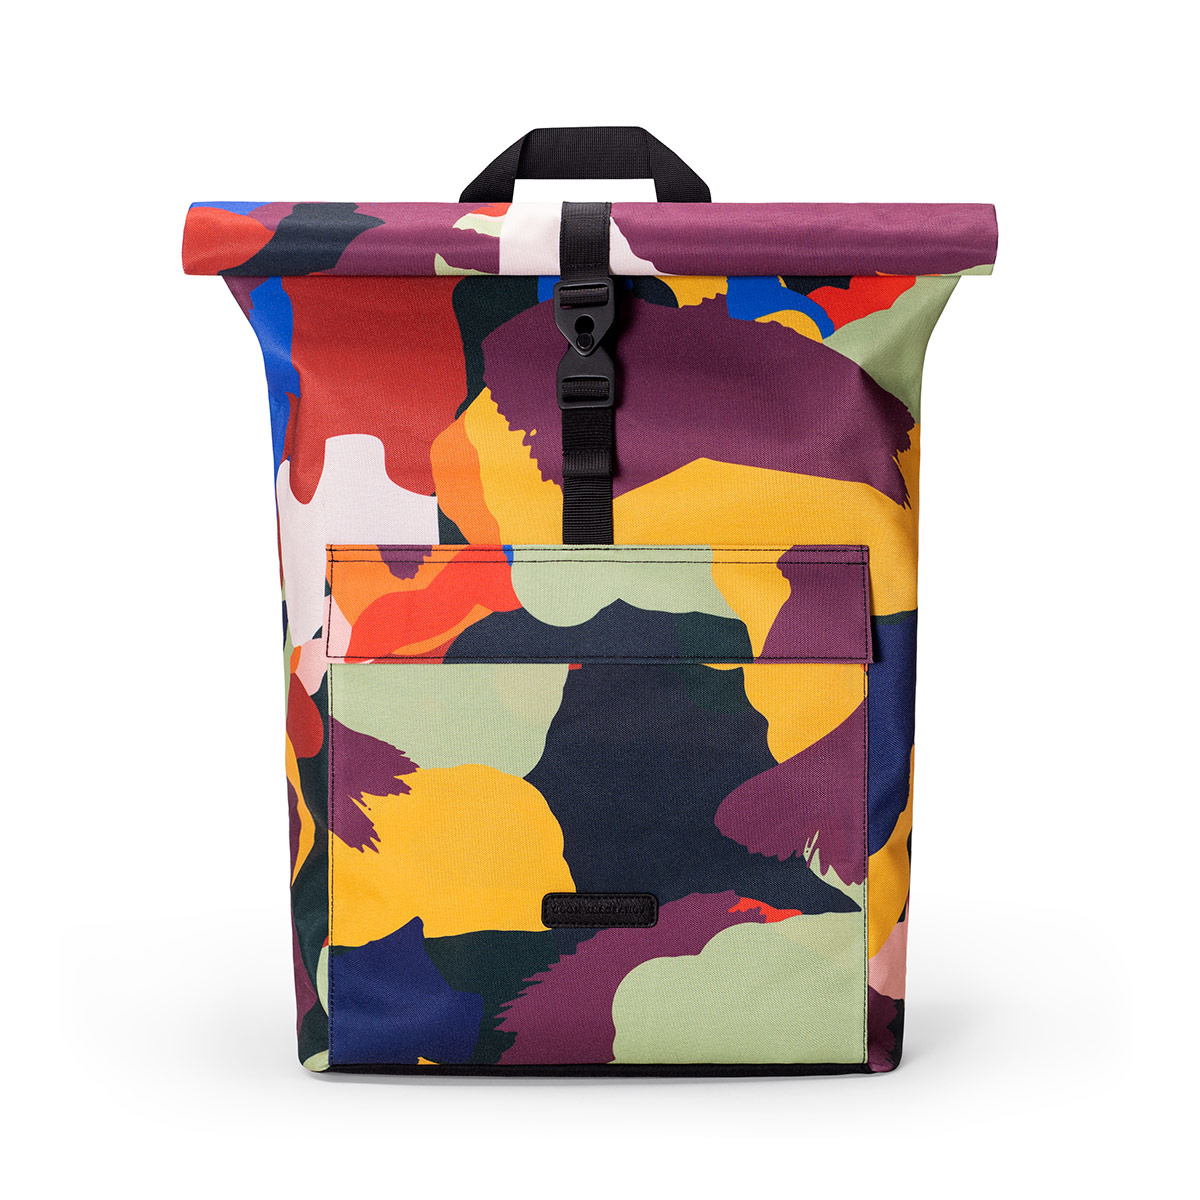 Ucon  Acrobatics JASPER BACKPACK Artist Collaboration Multicolour